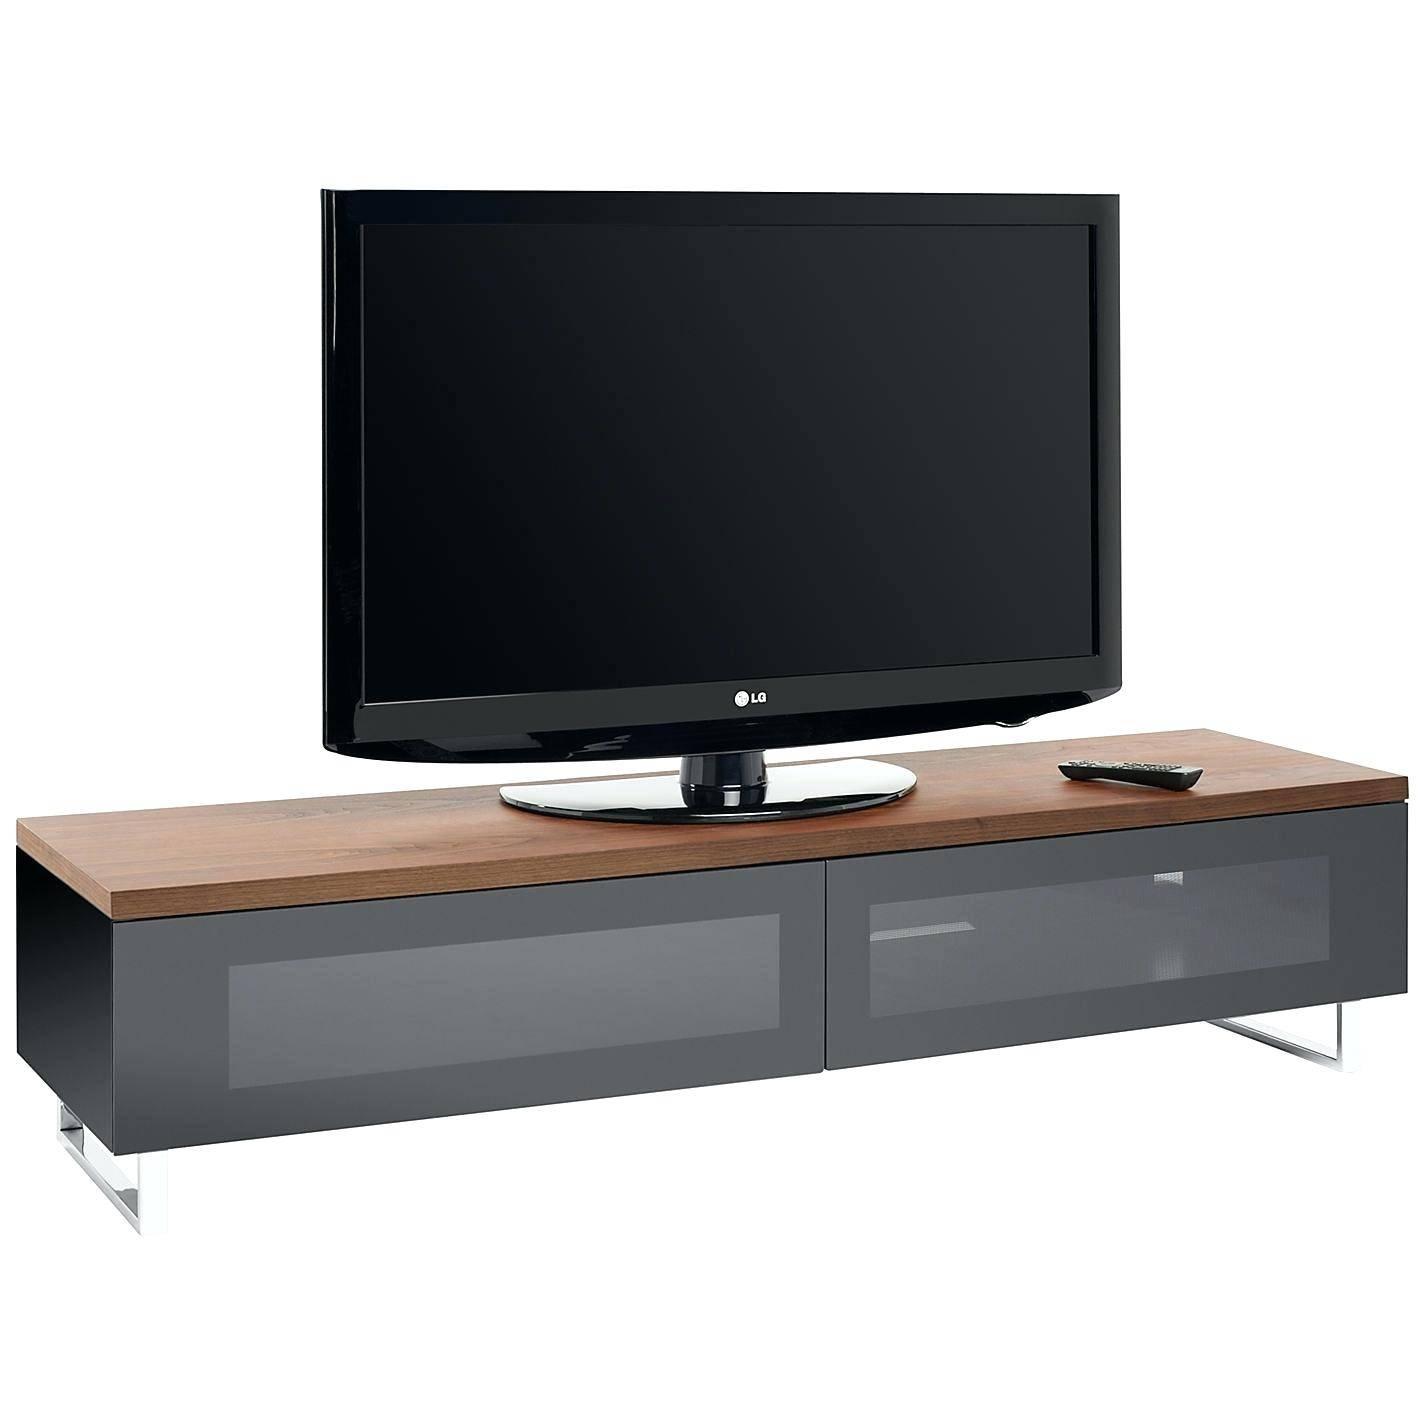 Tv Stand: Beautiful Techlink Corner Tv Stand Design Ideas. Modern intended for Techlink Corner Tv Stands (Image 14 of 15)